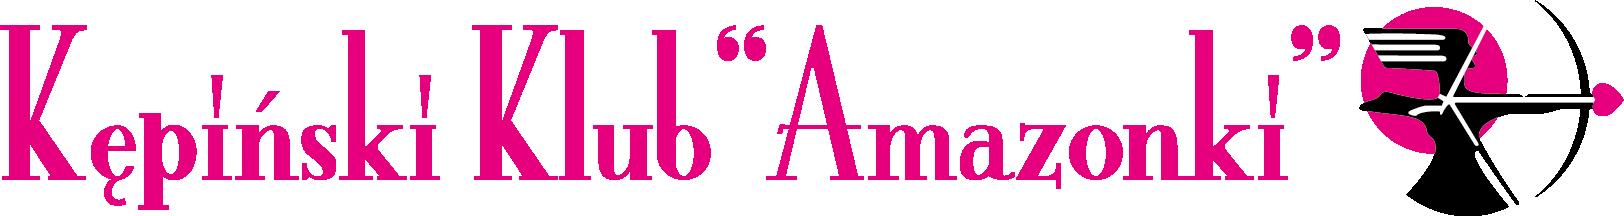 logo amazonkikepno